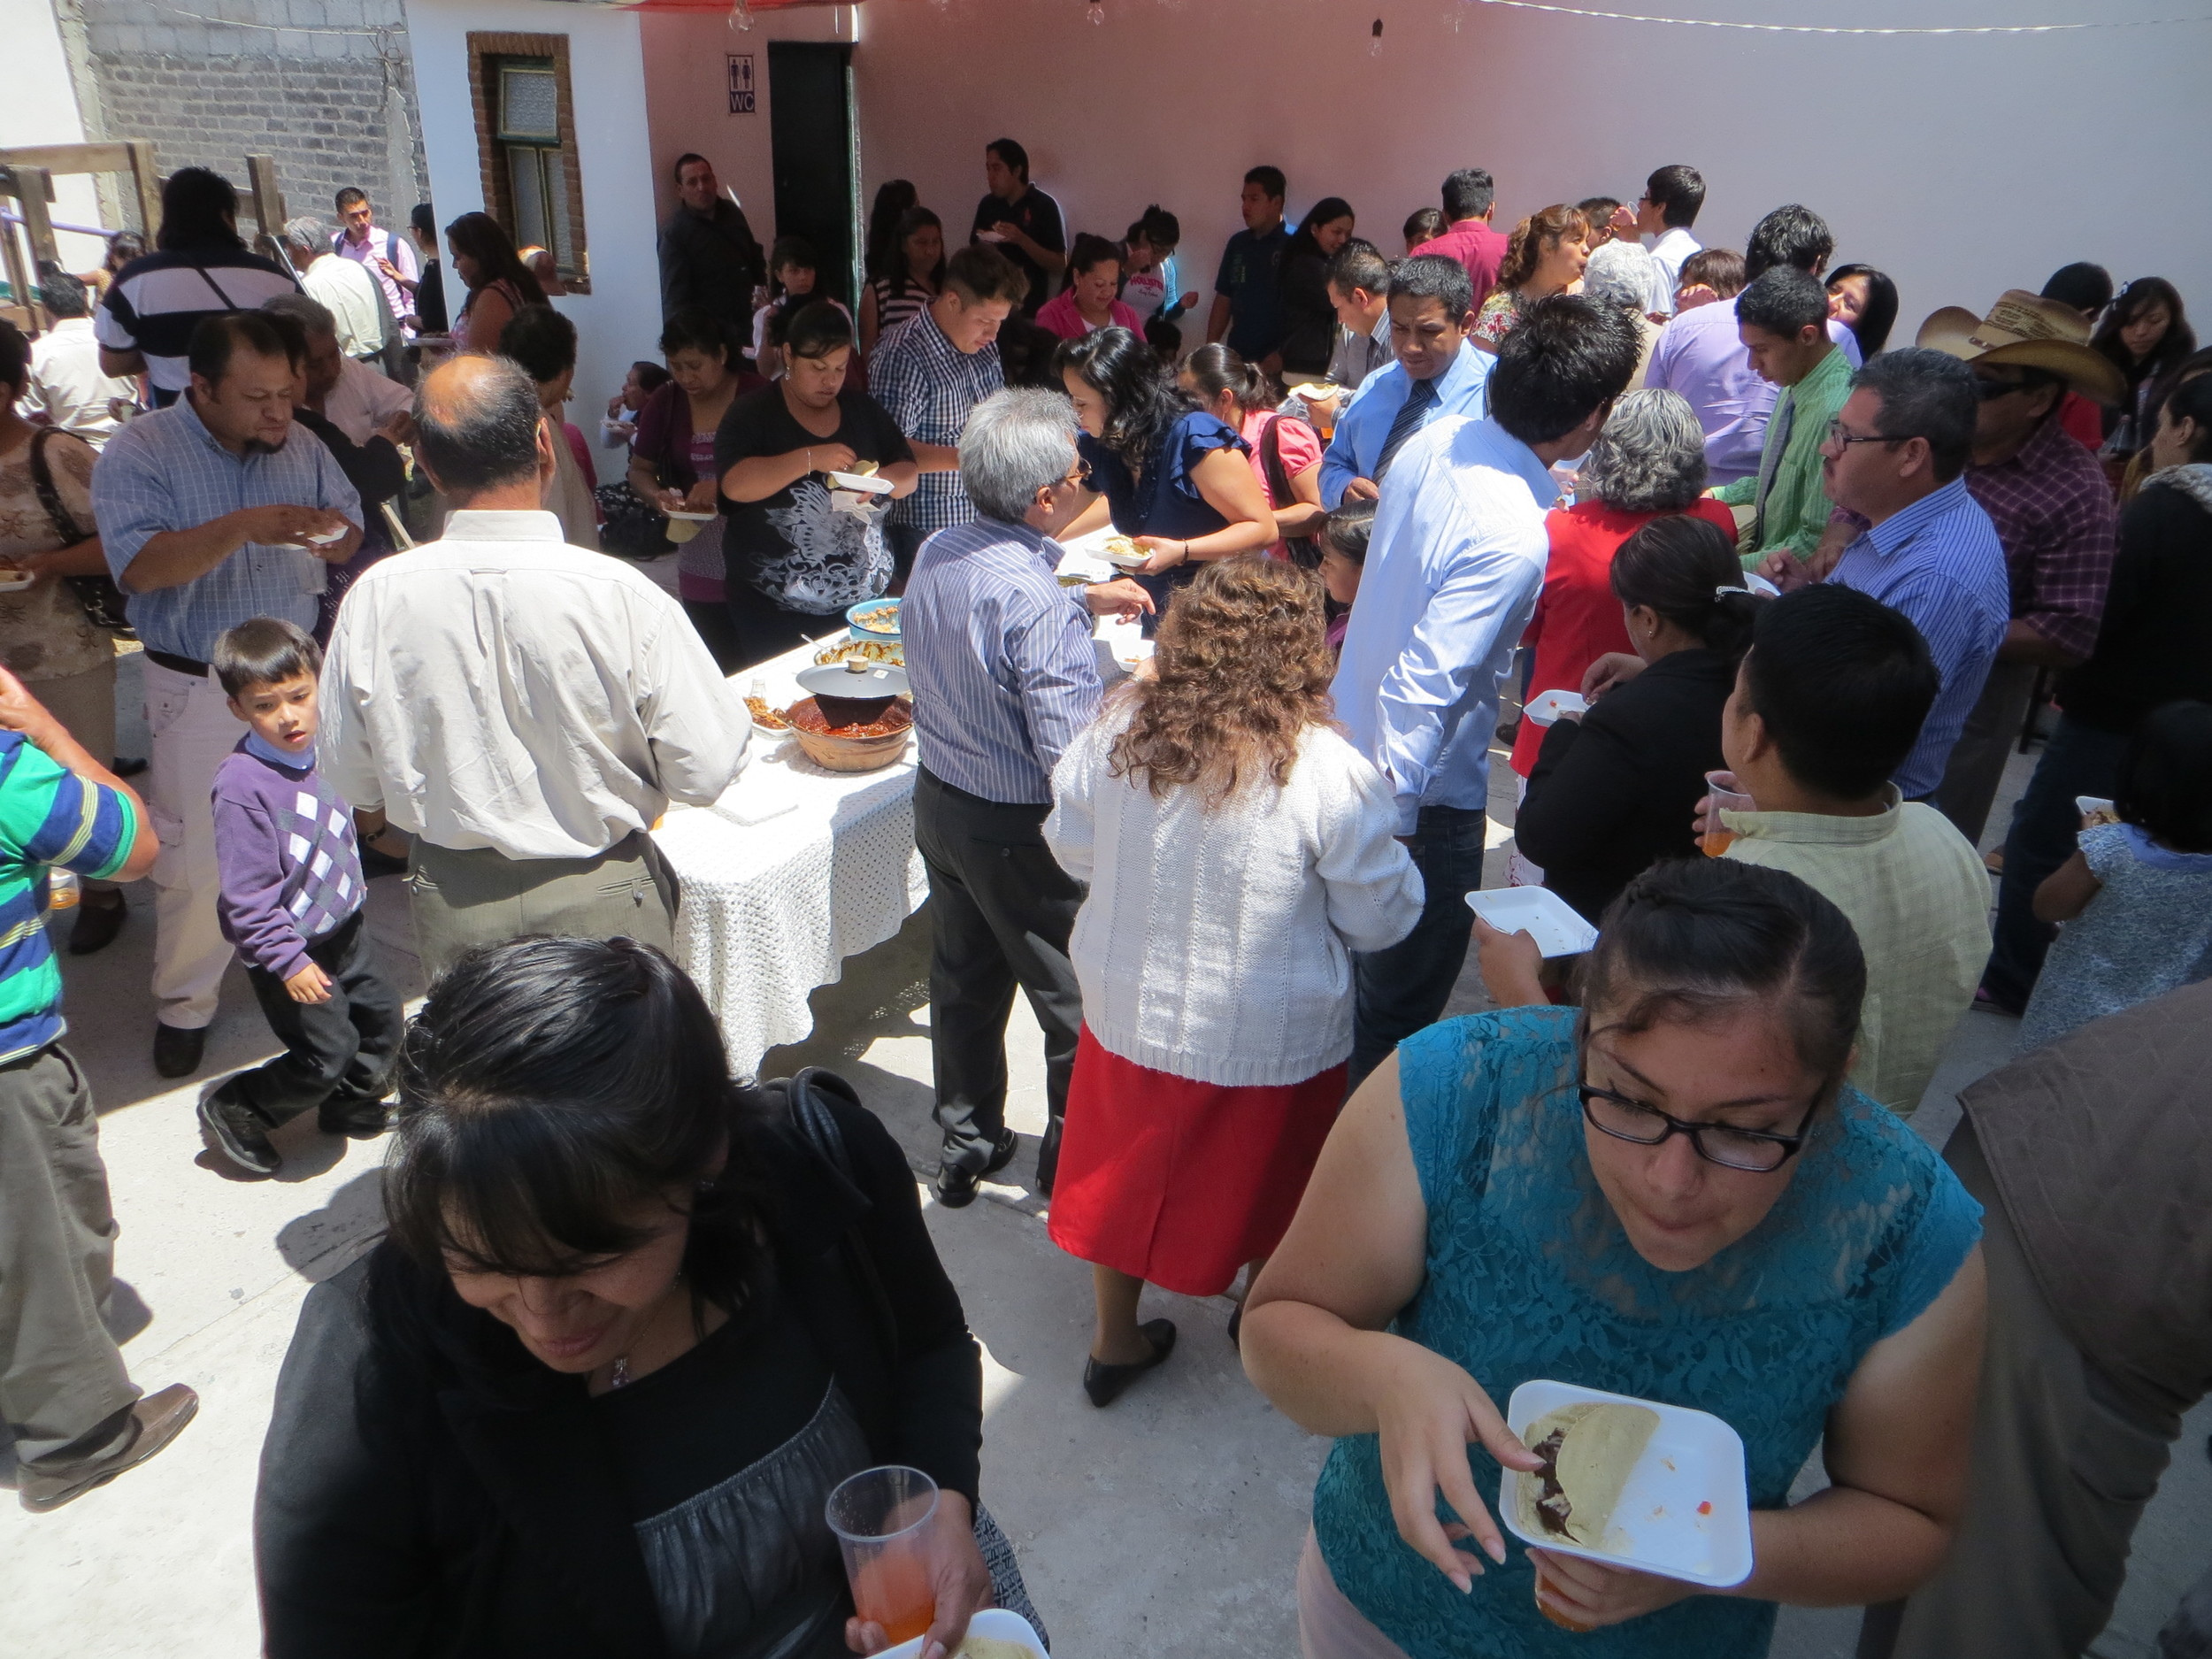 Easter Sunday Food & Fellowship